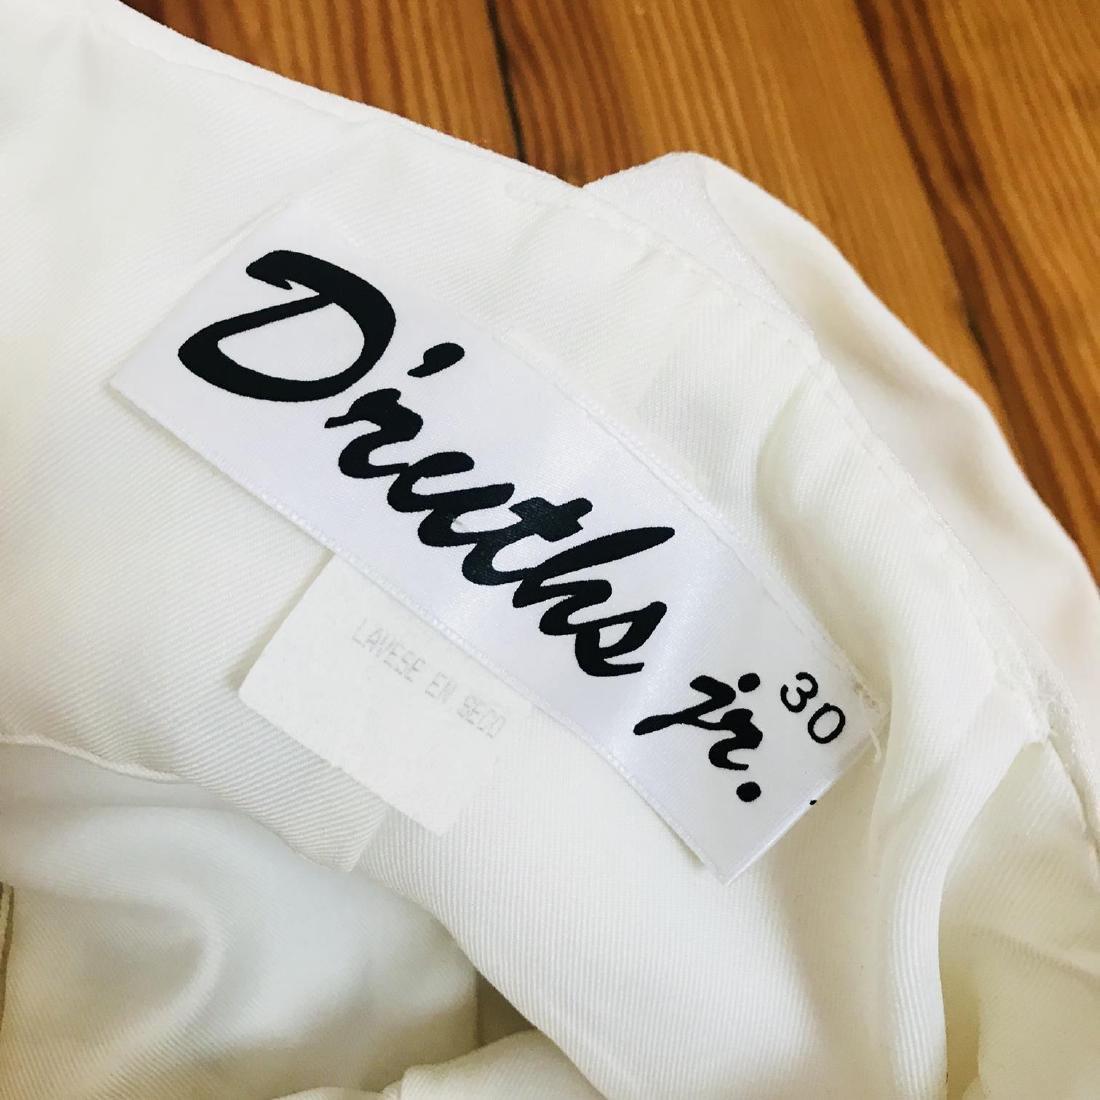 Vintage Women's White Designer Dress Size US 8 EUR 38 - 9